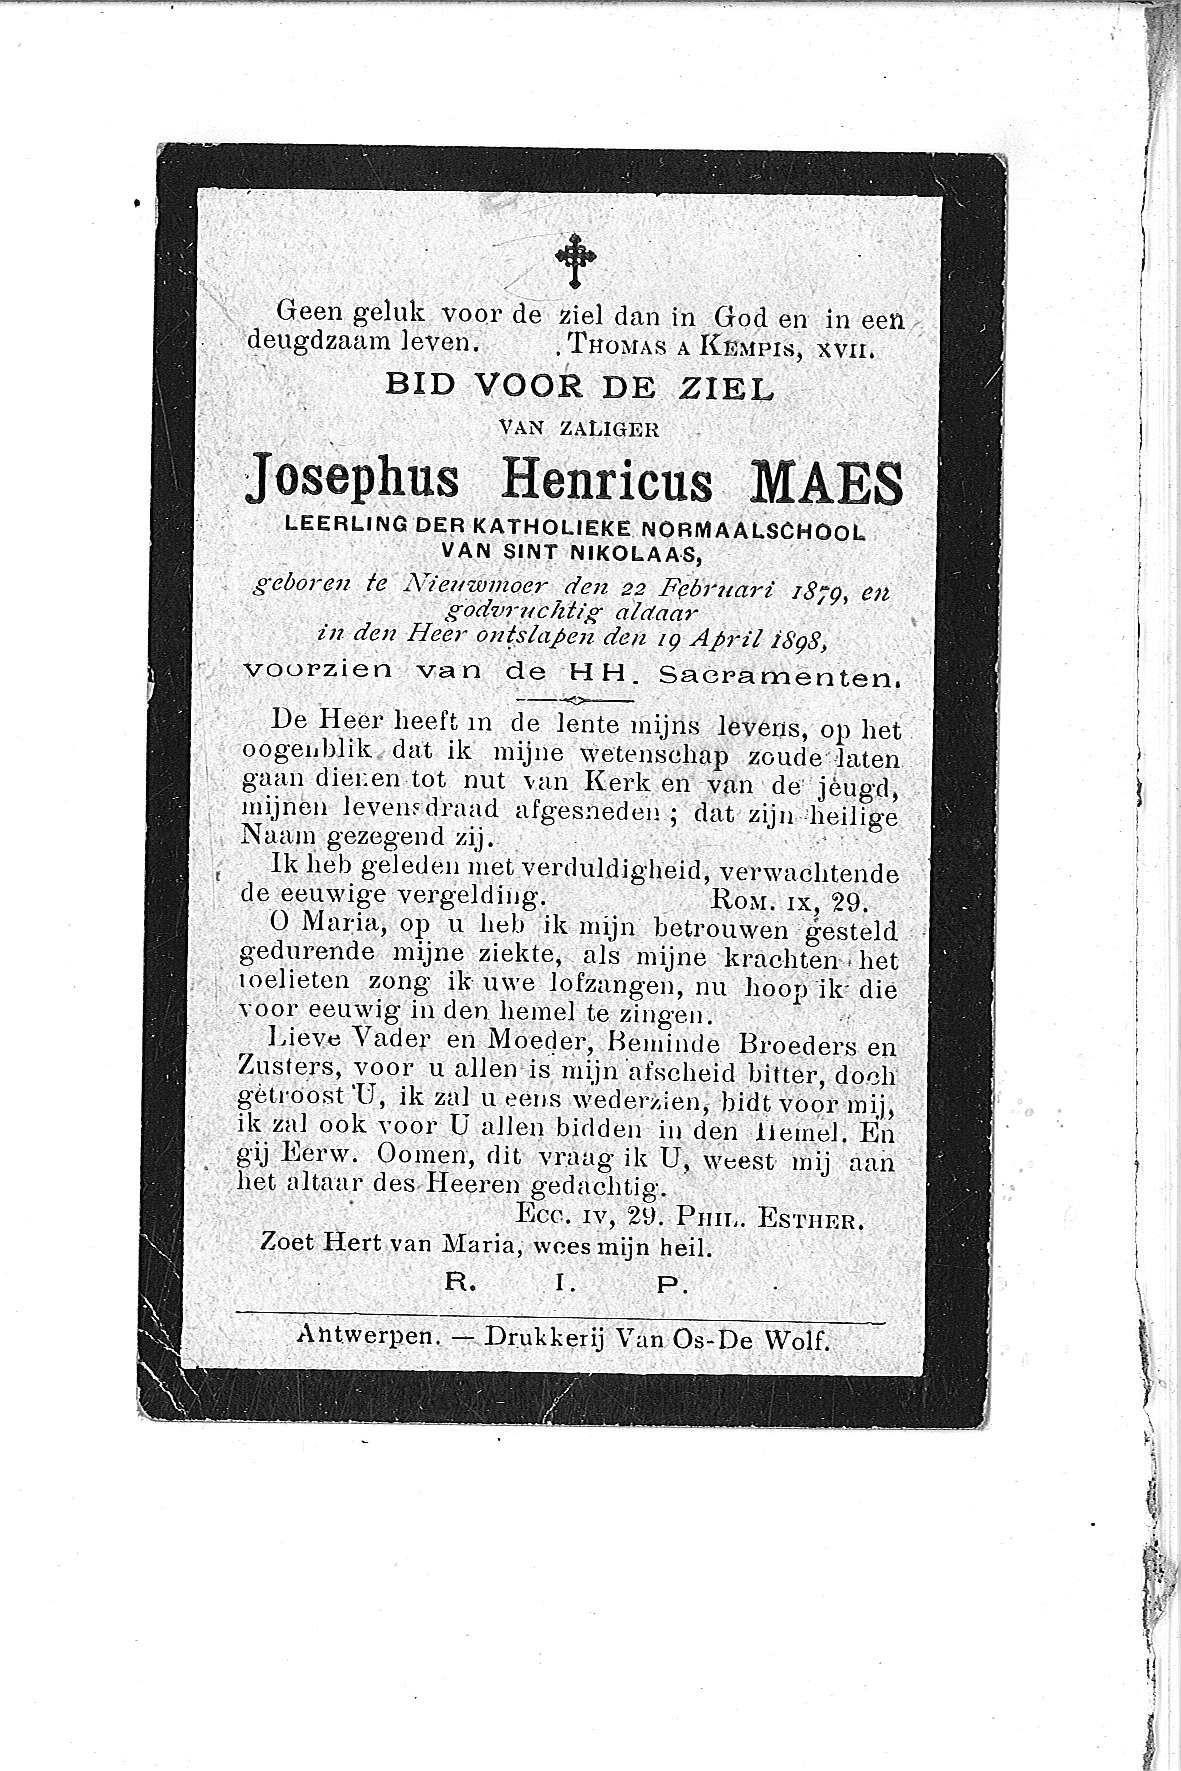 Josephus-Henricus(1898)20111109083150_00261.jpg